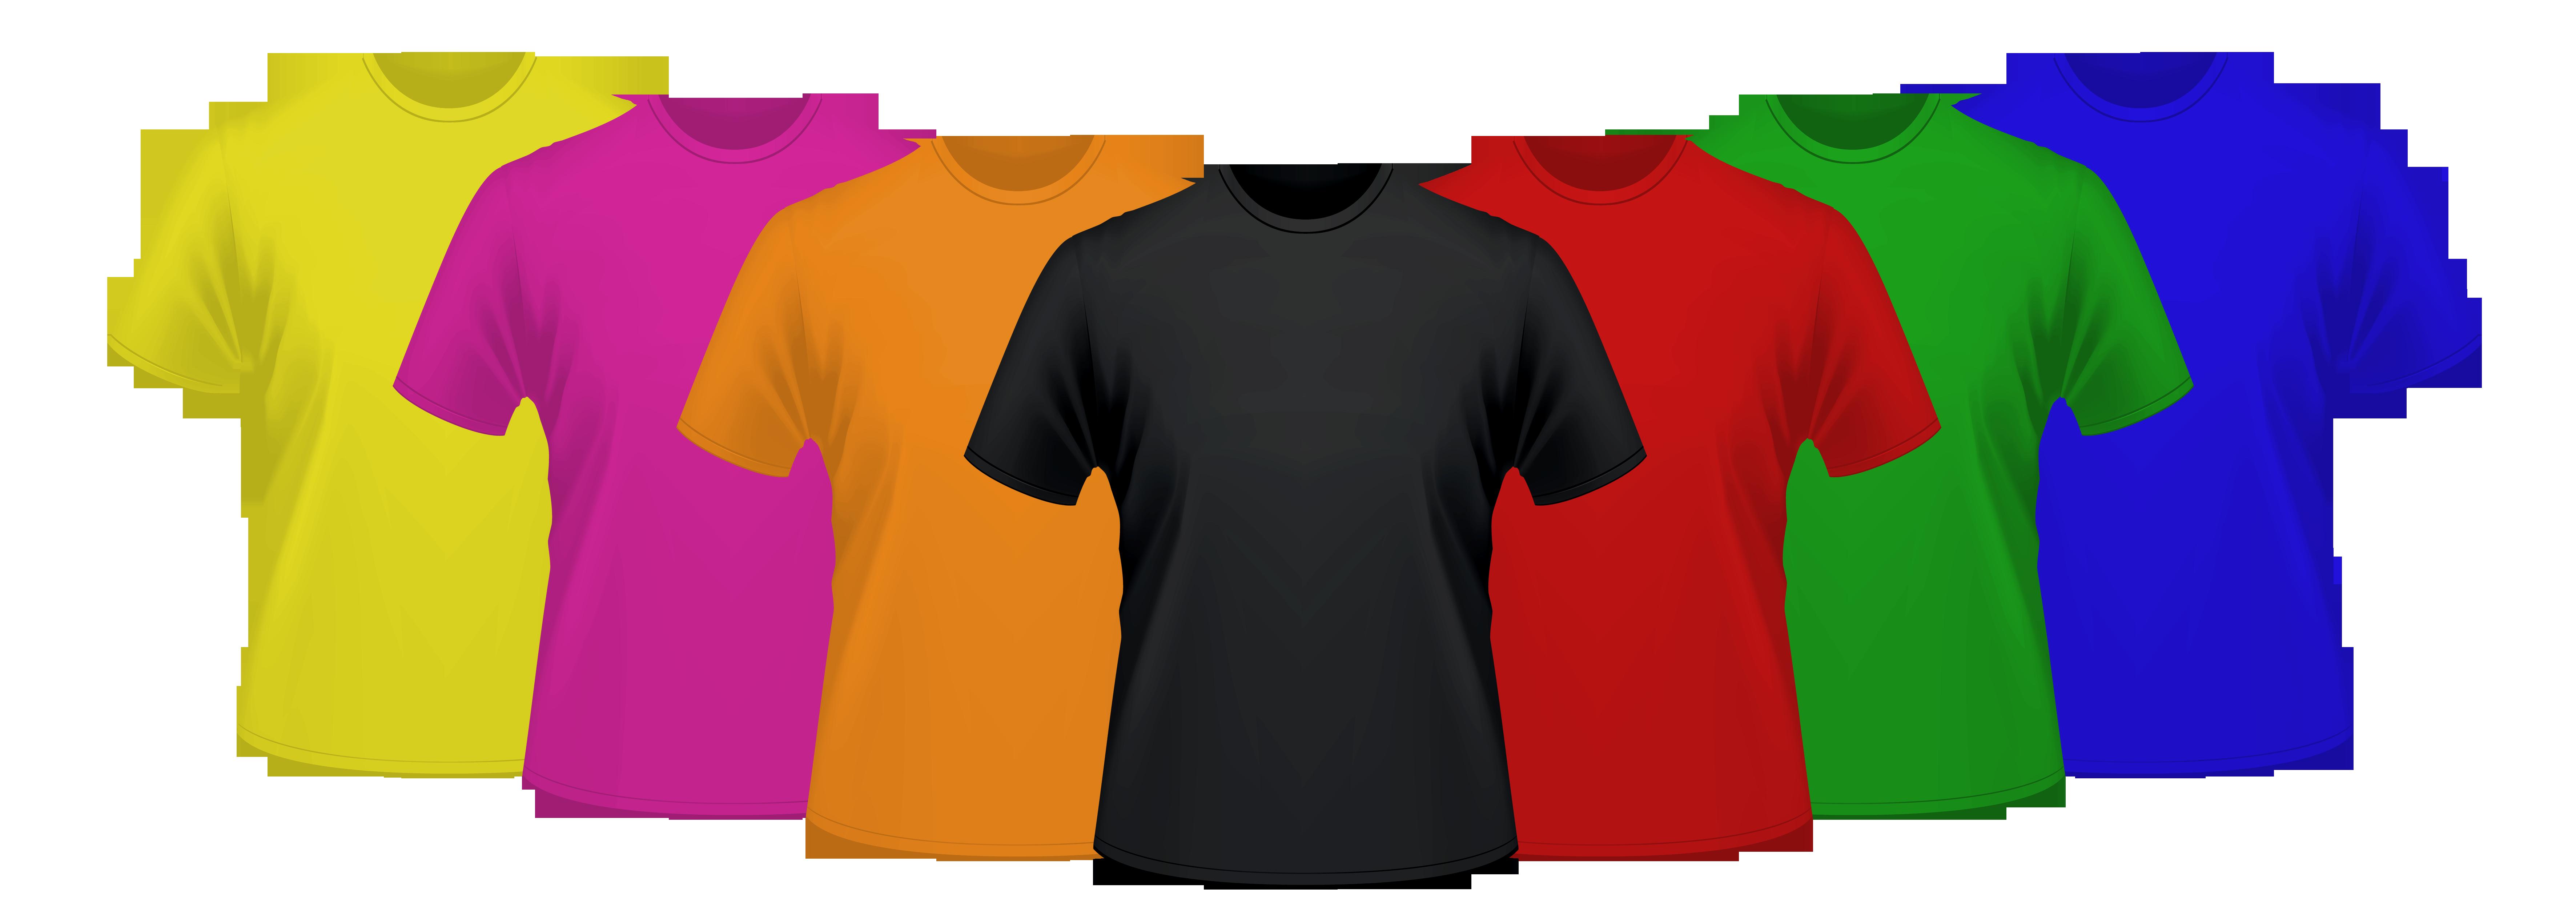 Custom T Shirts   Teespring